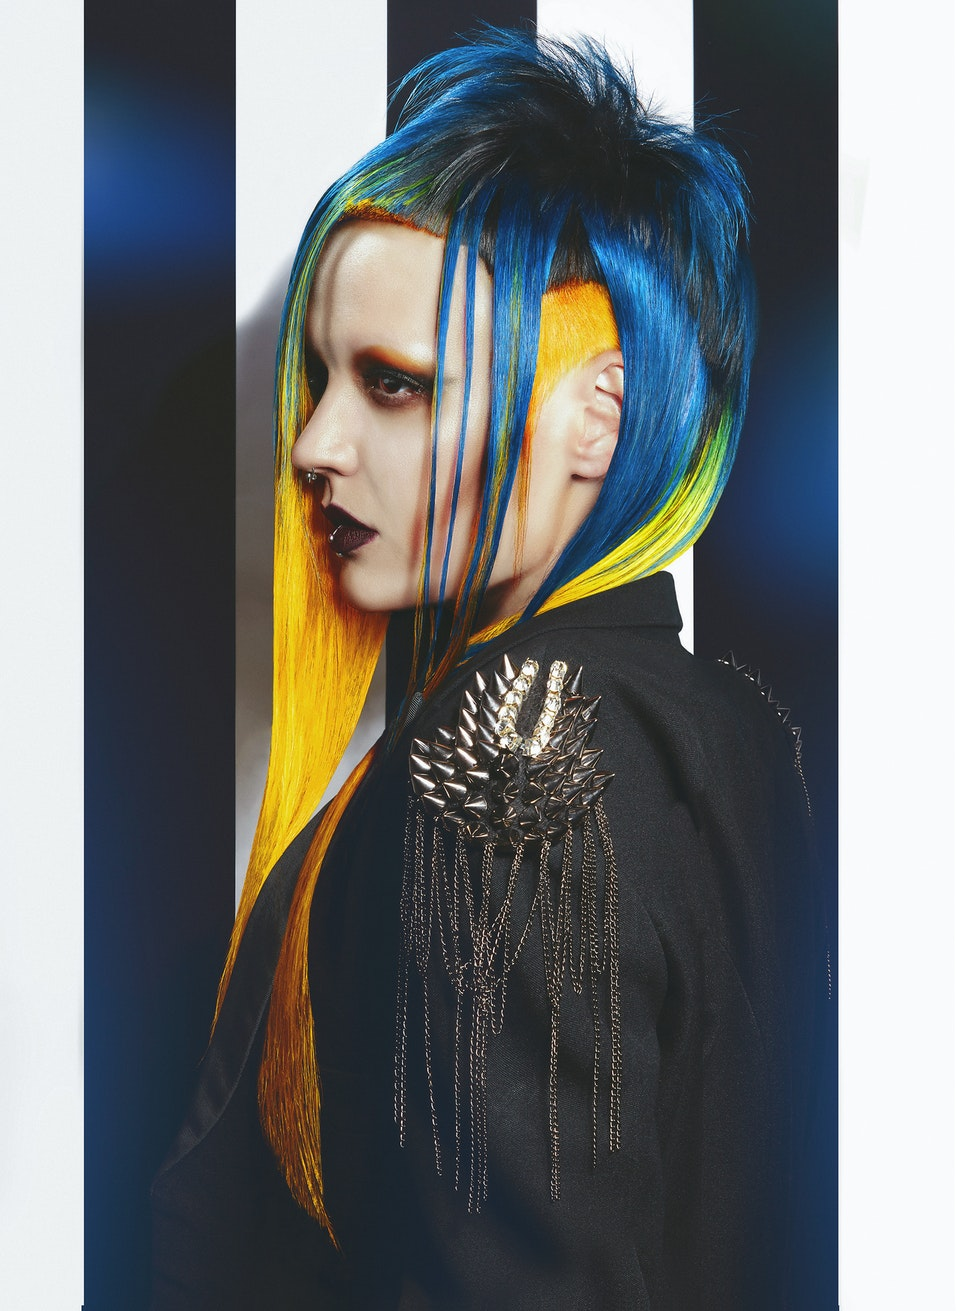 JARRED Photography - MARLENE LAMONT - URBAN HAIR - FELLOWSHIP